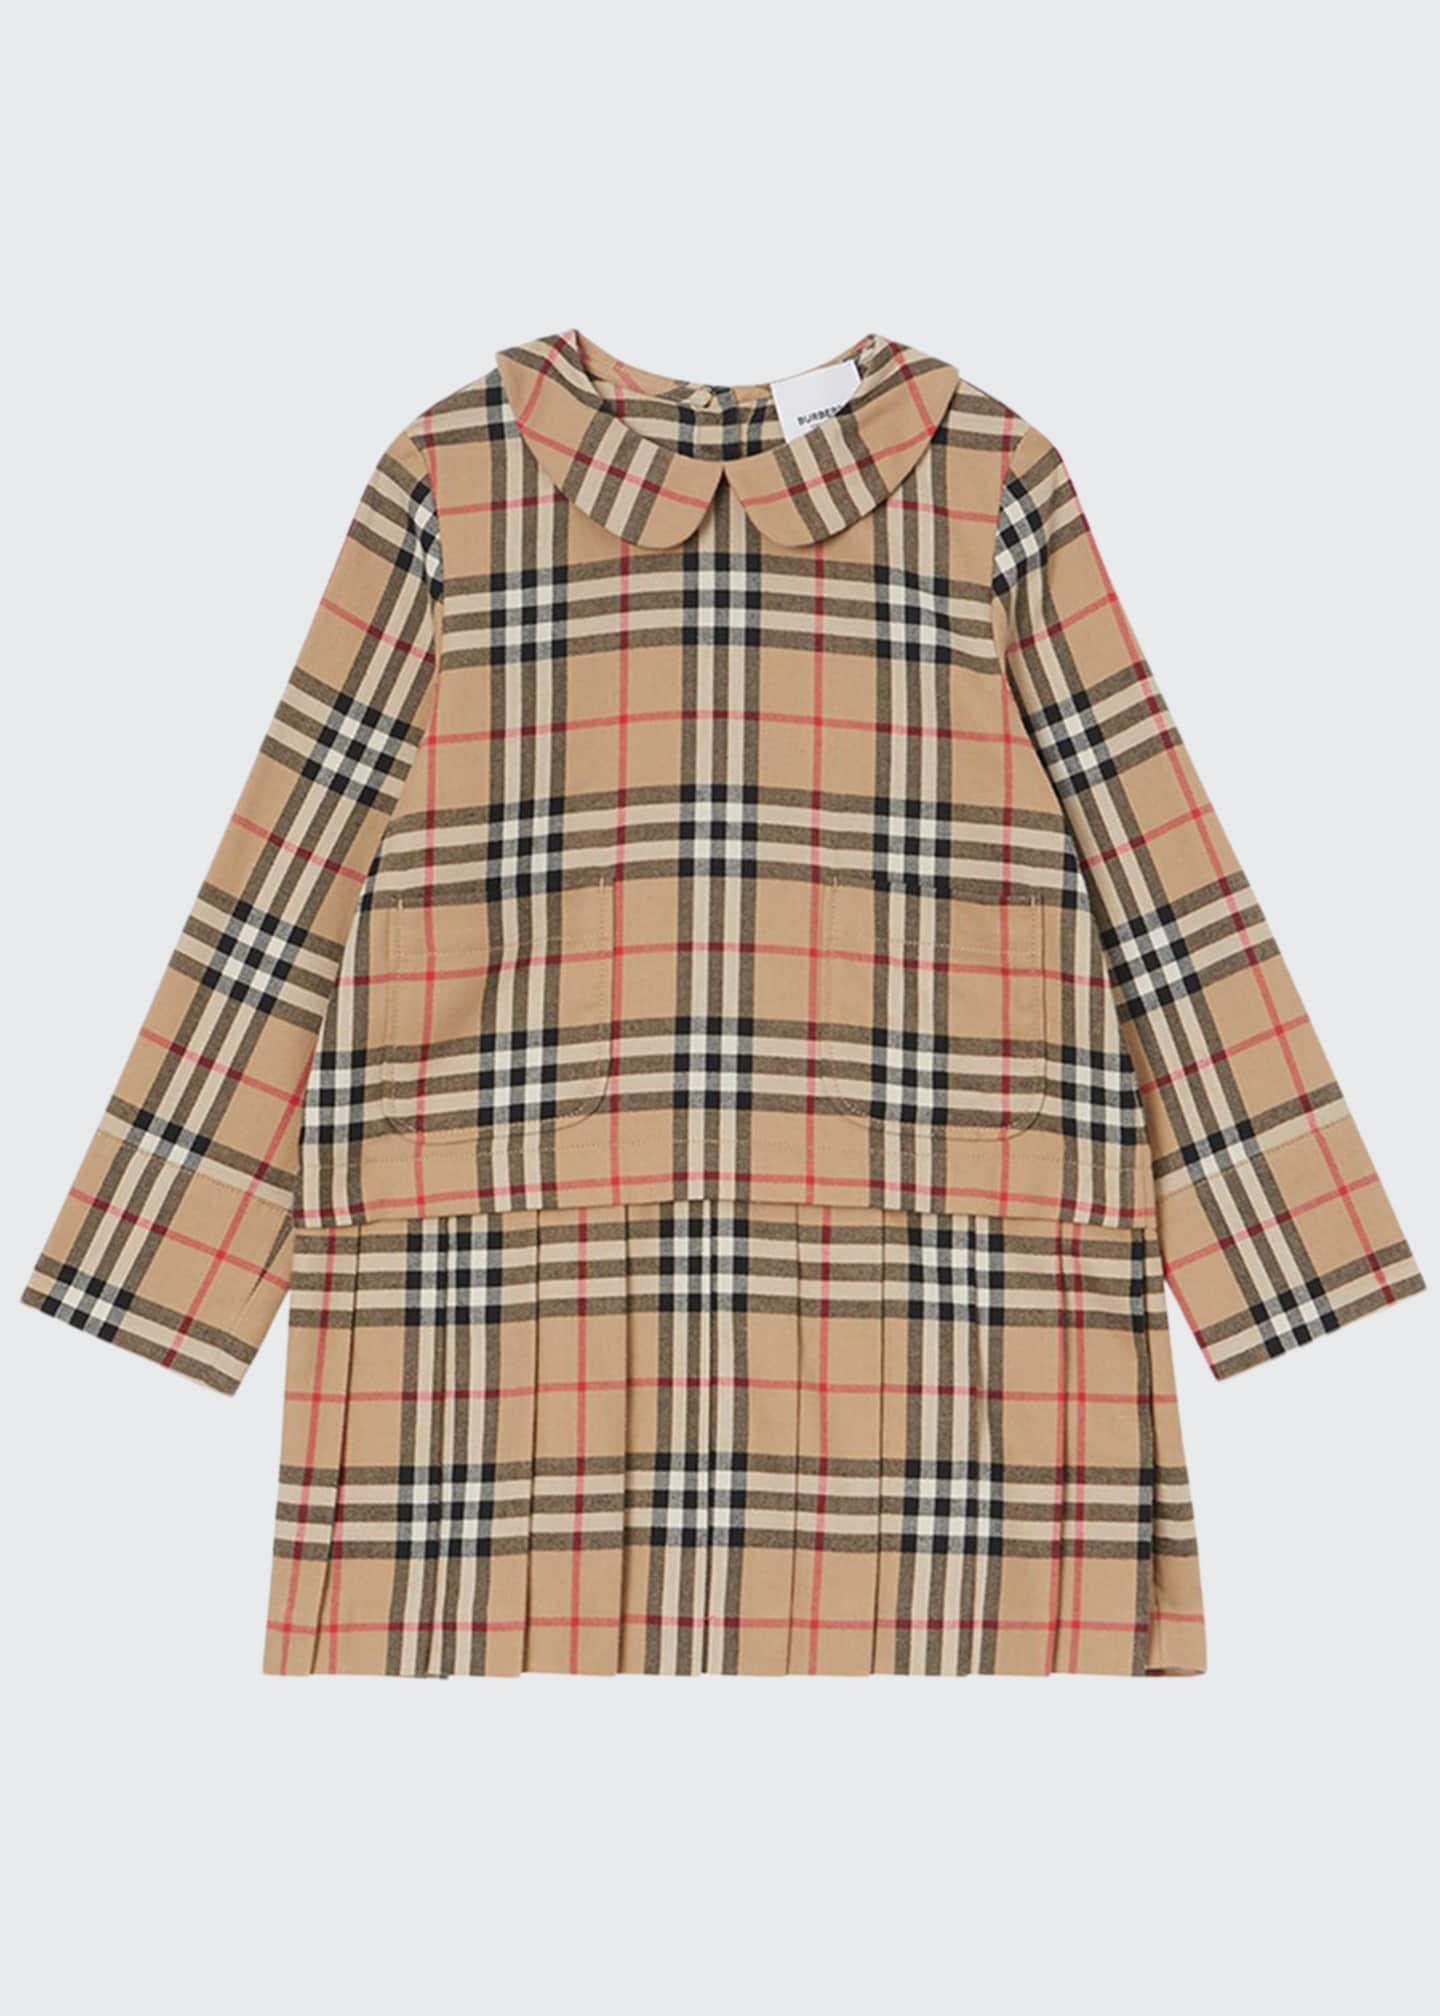 Burberry Girl's Melania Flannel Check Dress, Size 3-14